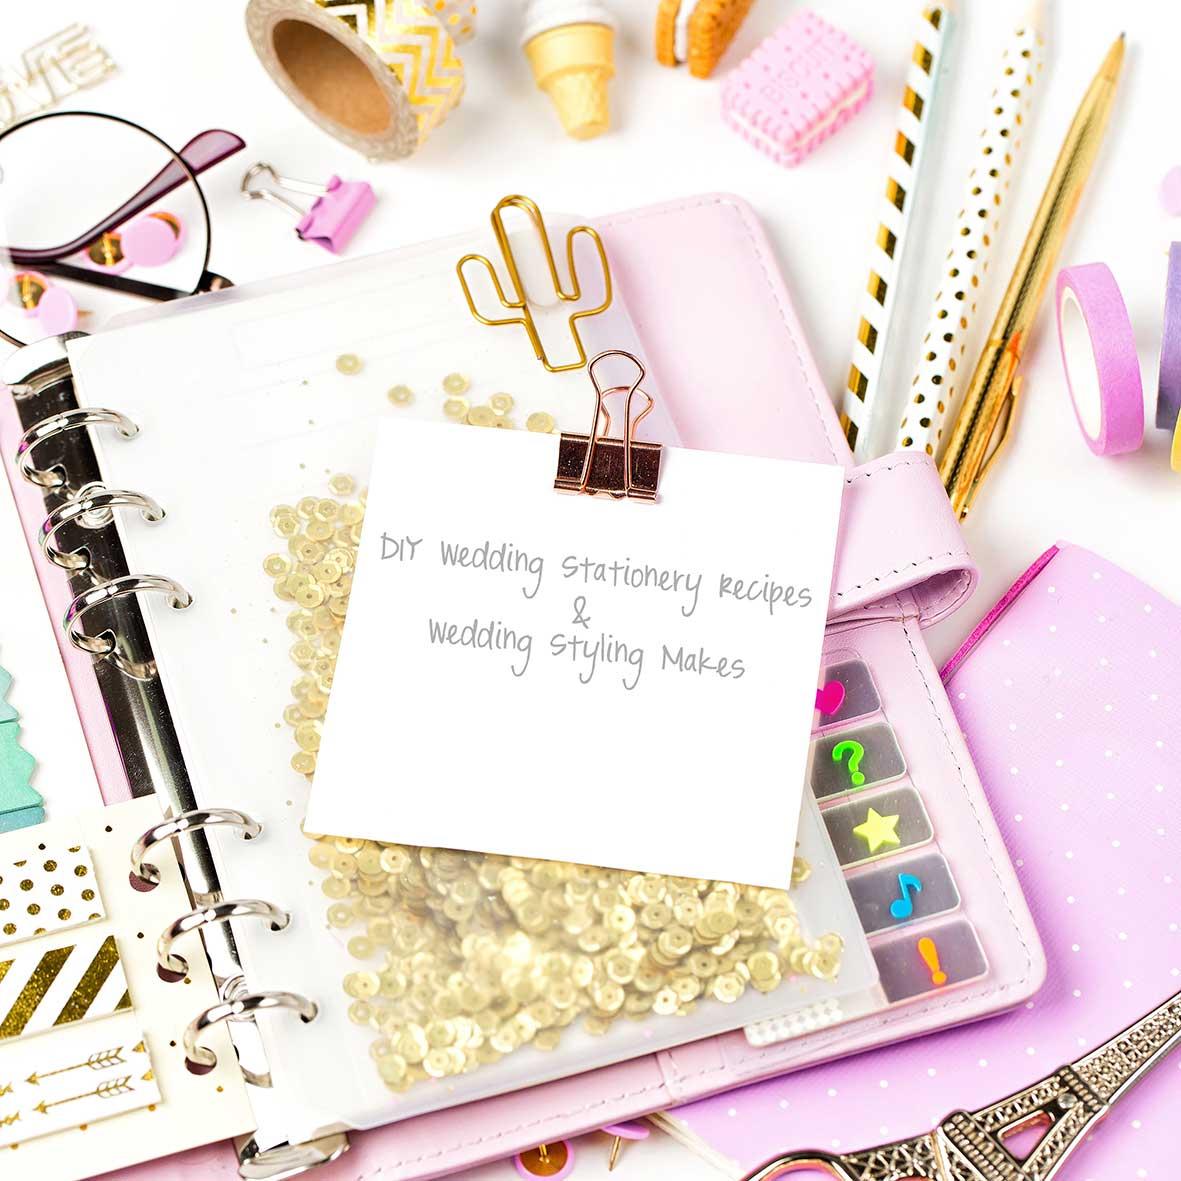 DIY Wedding Stationery, Wedding Invitations & Wedding Craft Supplies